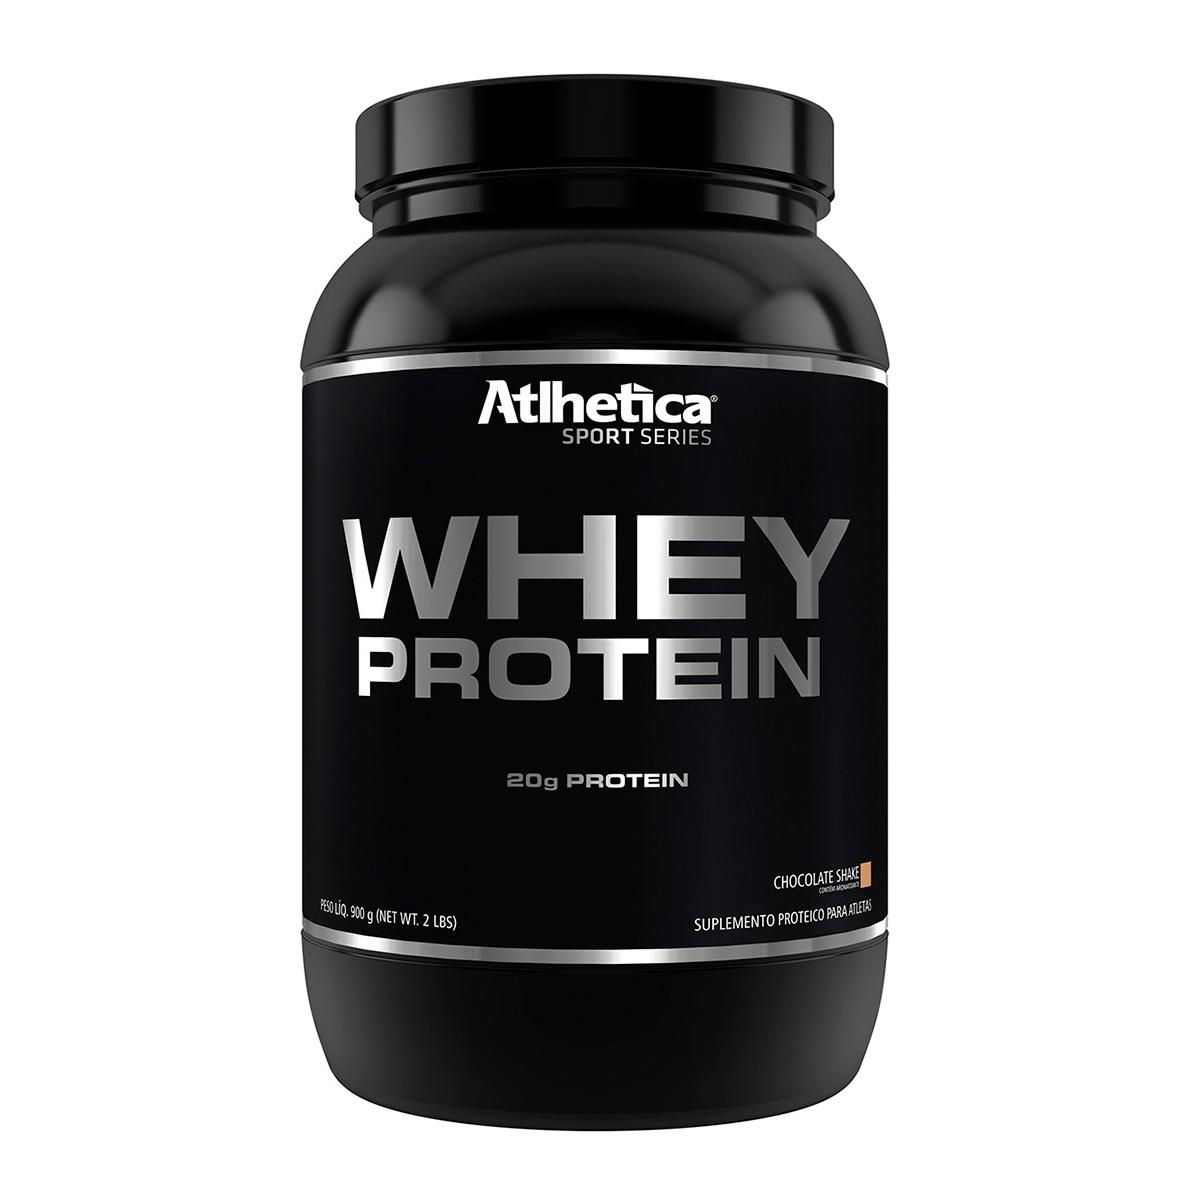 whey protein - Whey Protein 900g - R$59,90